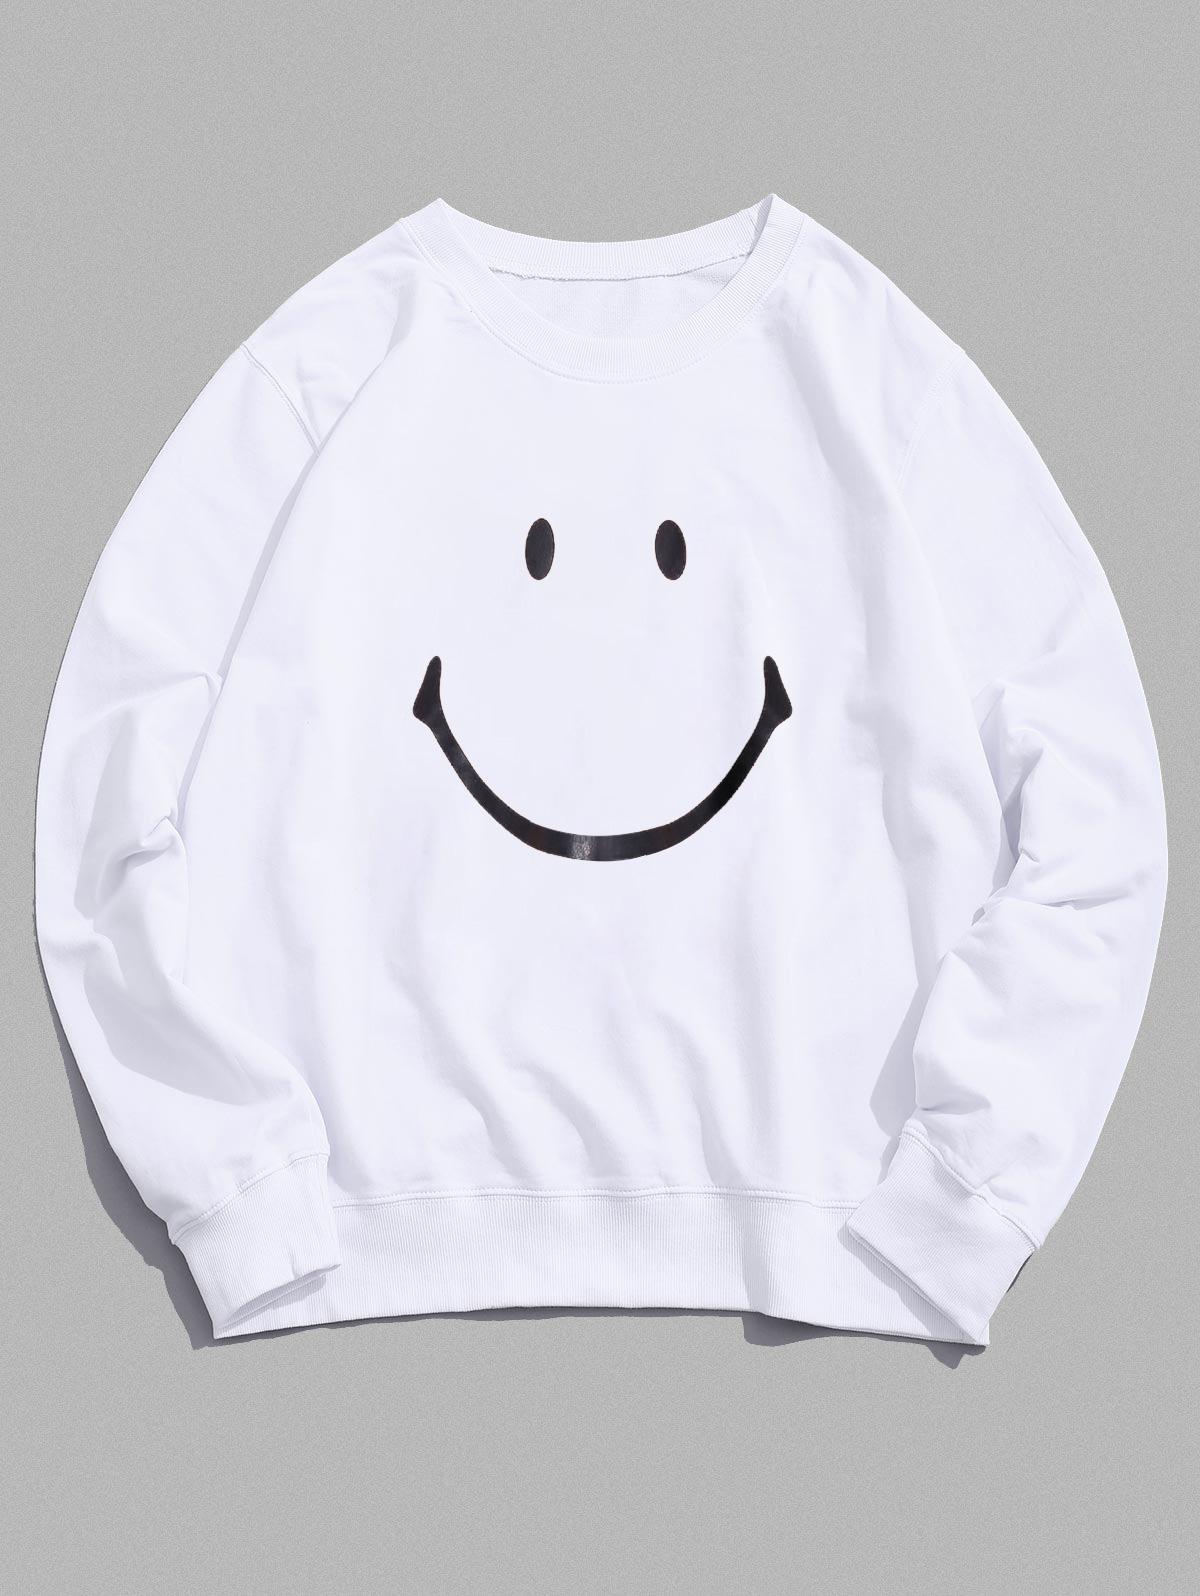 Lounge Smiley Face Graphic Crew Neck Sweatshirt, White